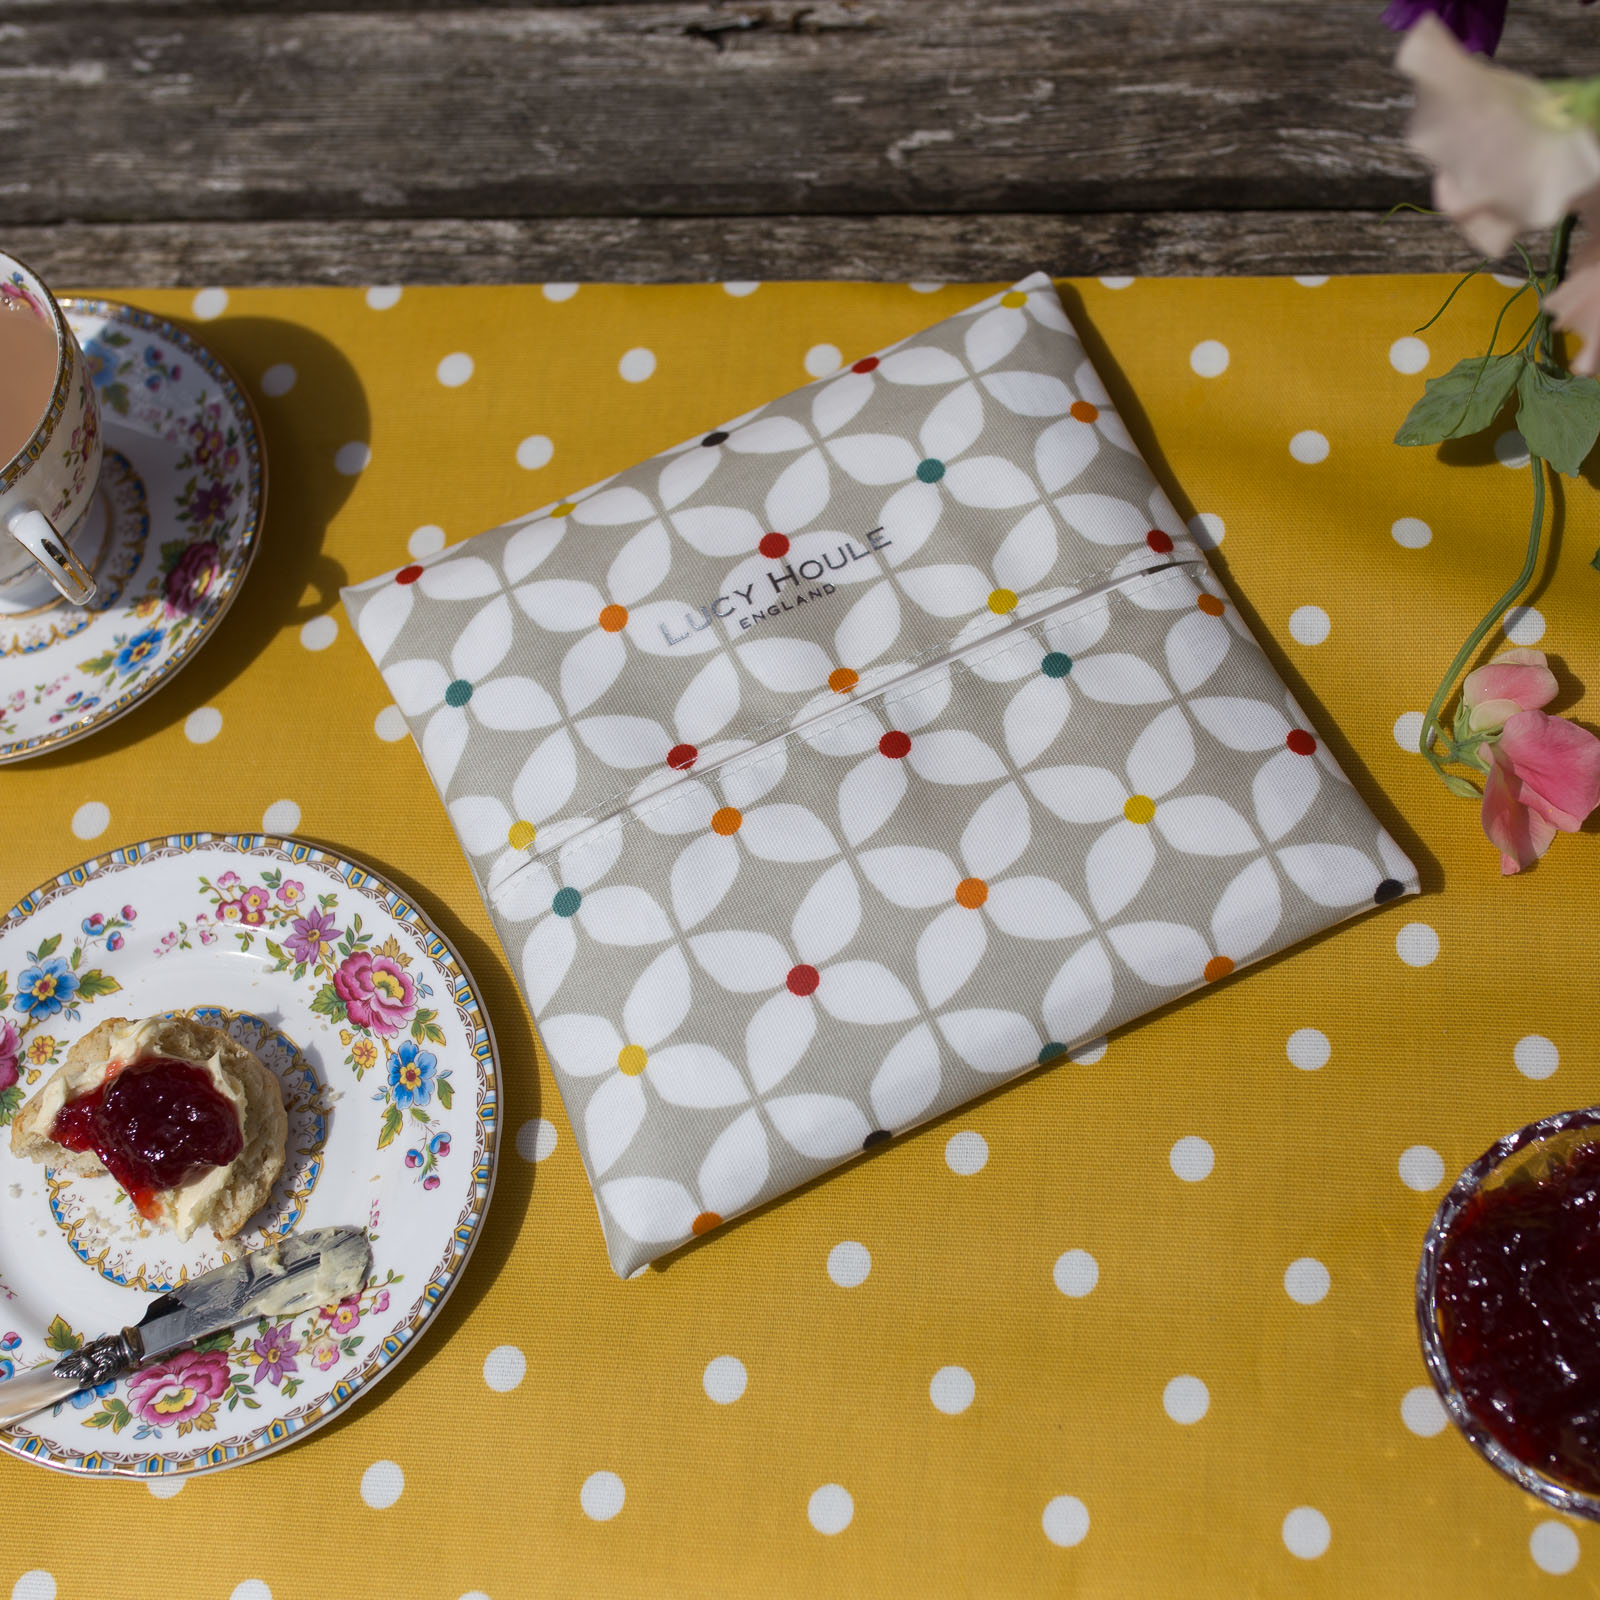 Modern Daisy Taupe Spot Paper Napkin Holder